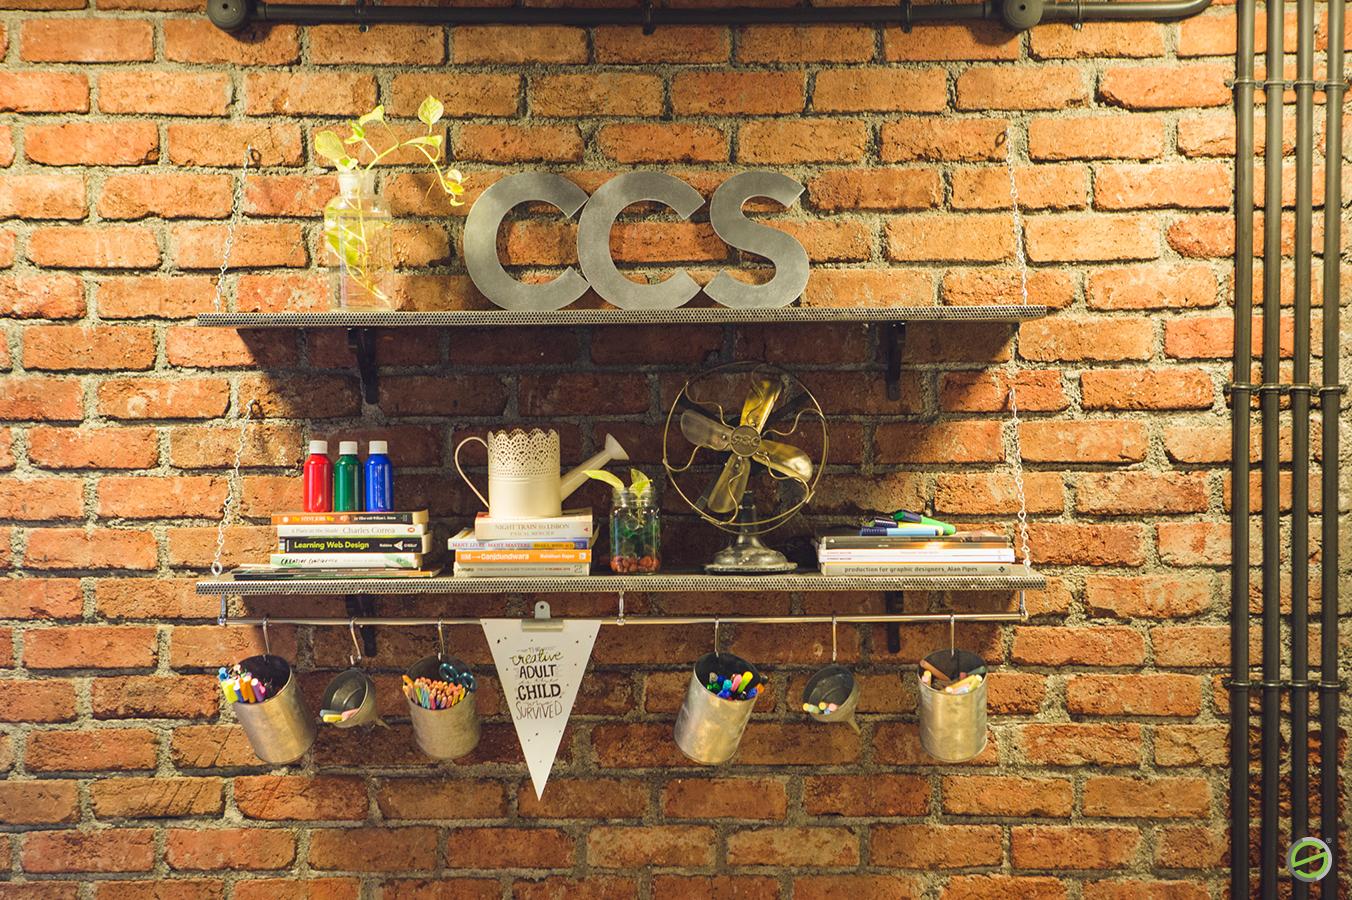 ccs-office-3